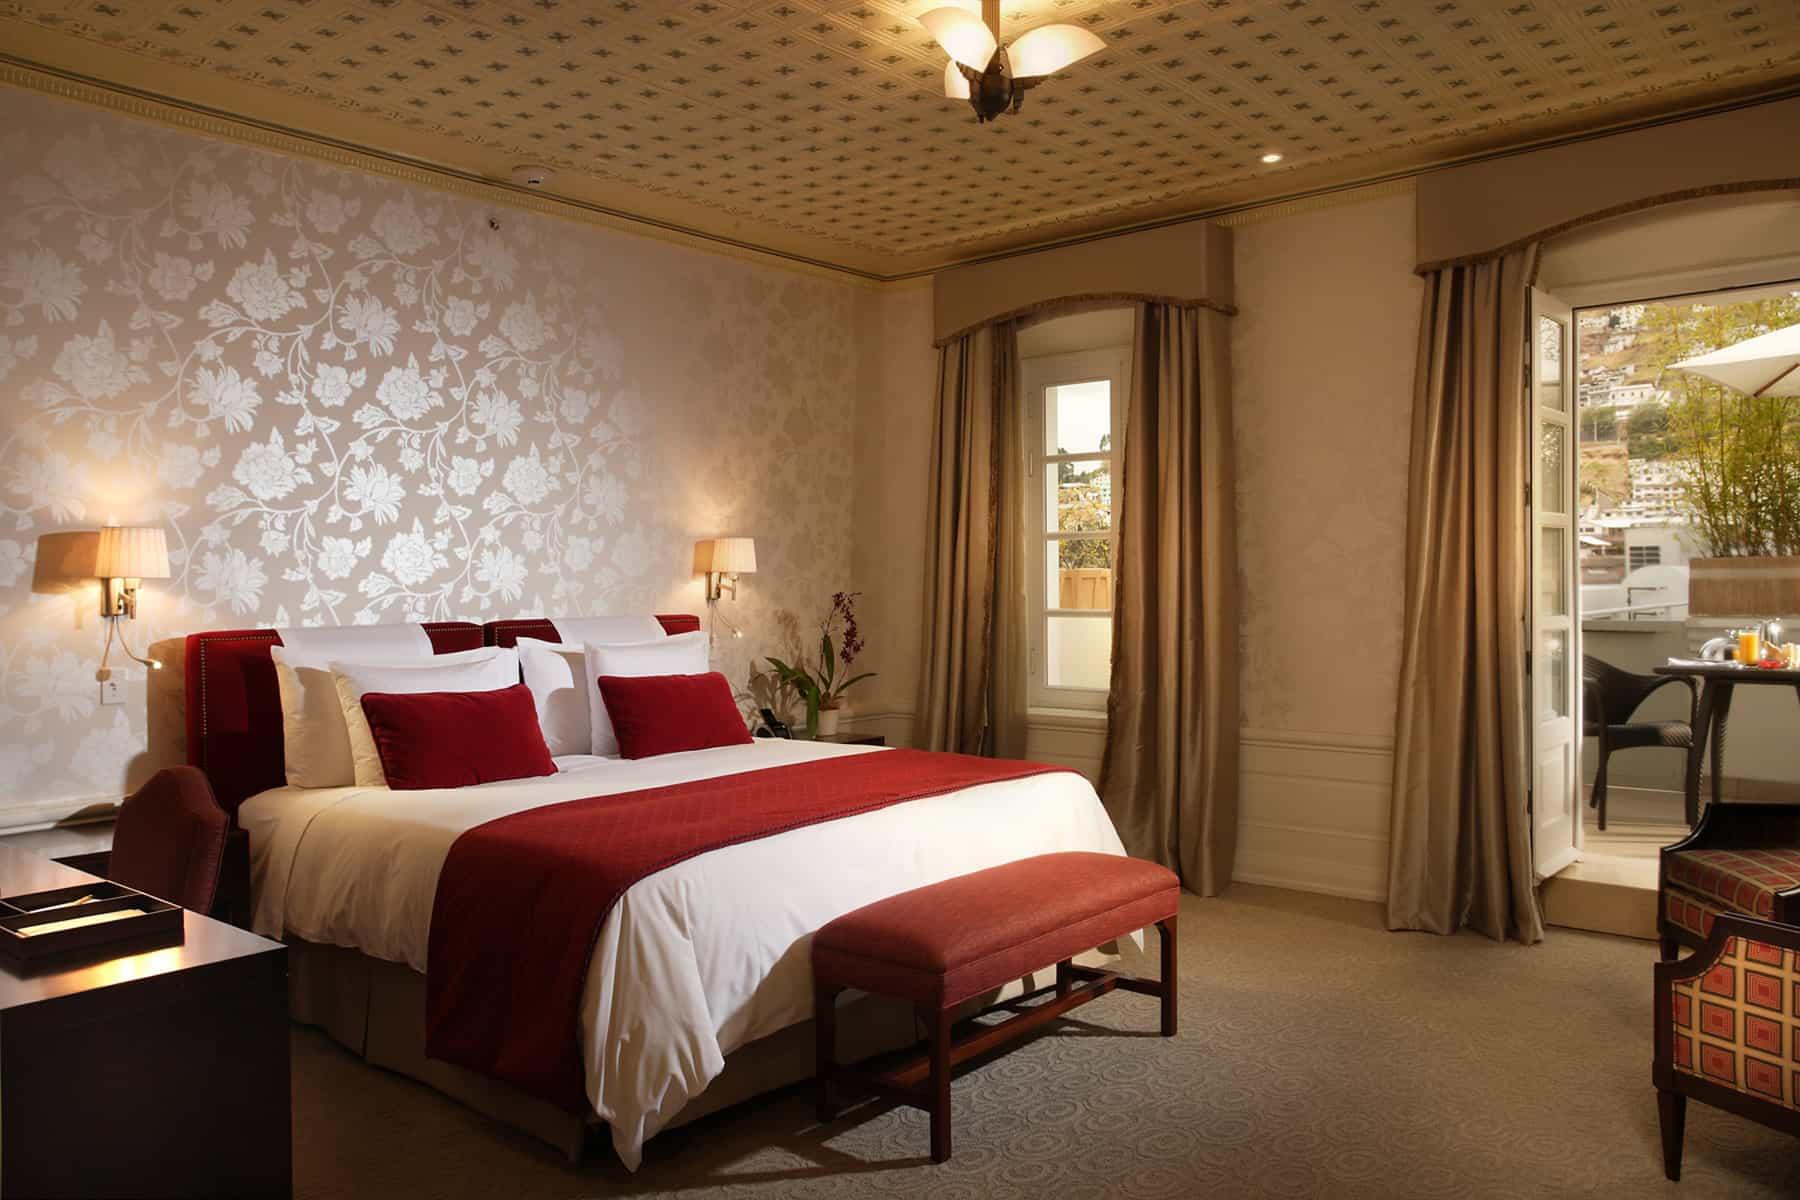 casa-gangotena-rooms-terrace-suite-02.jpg